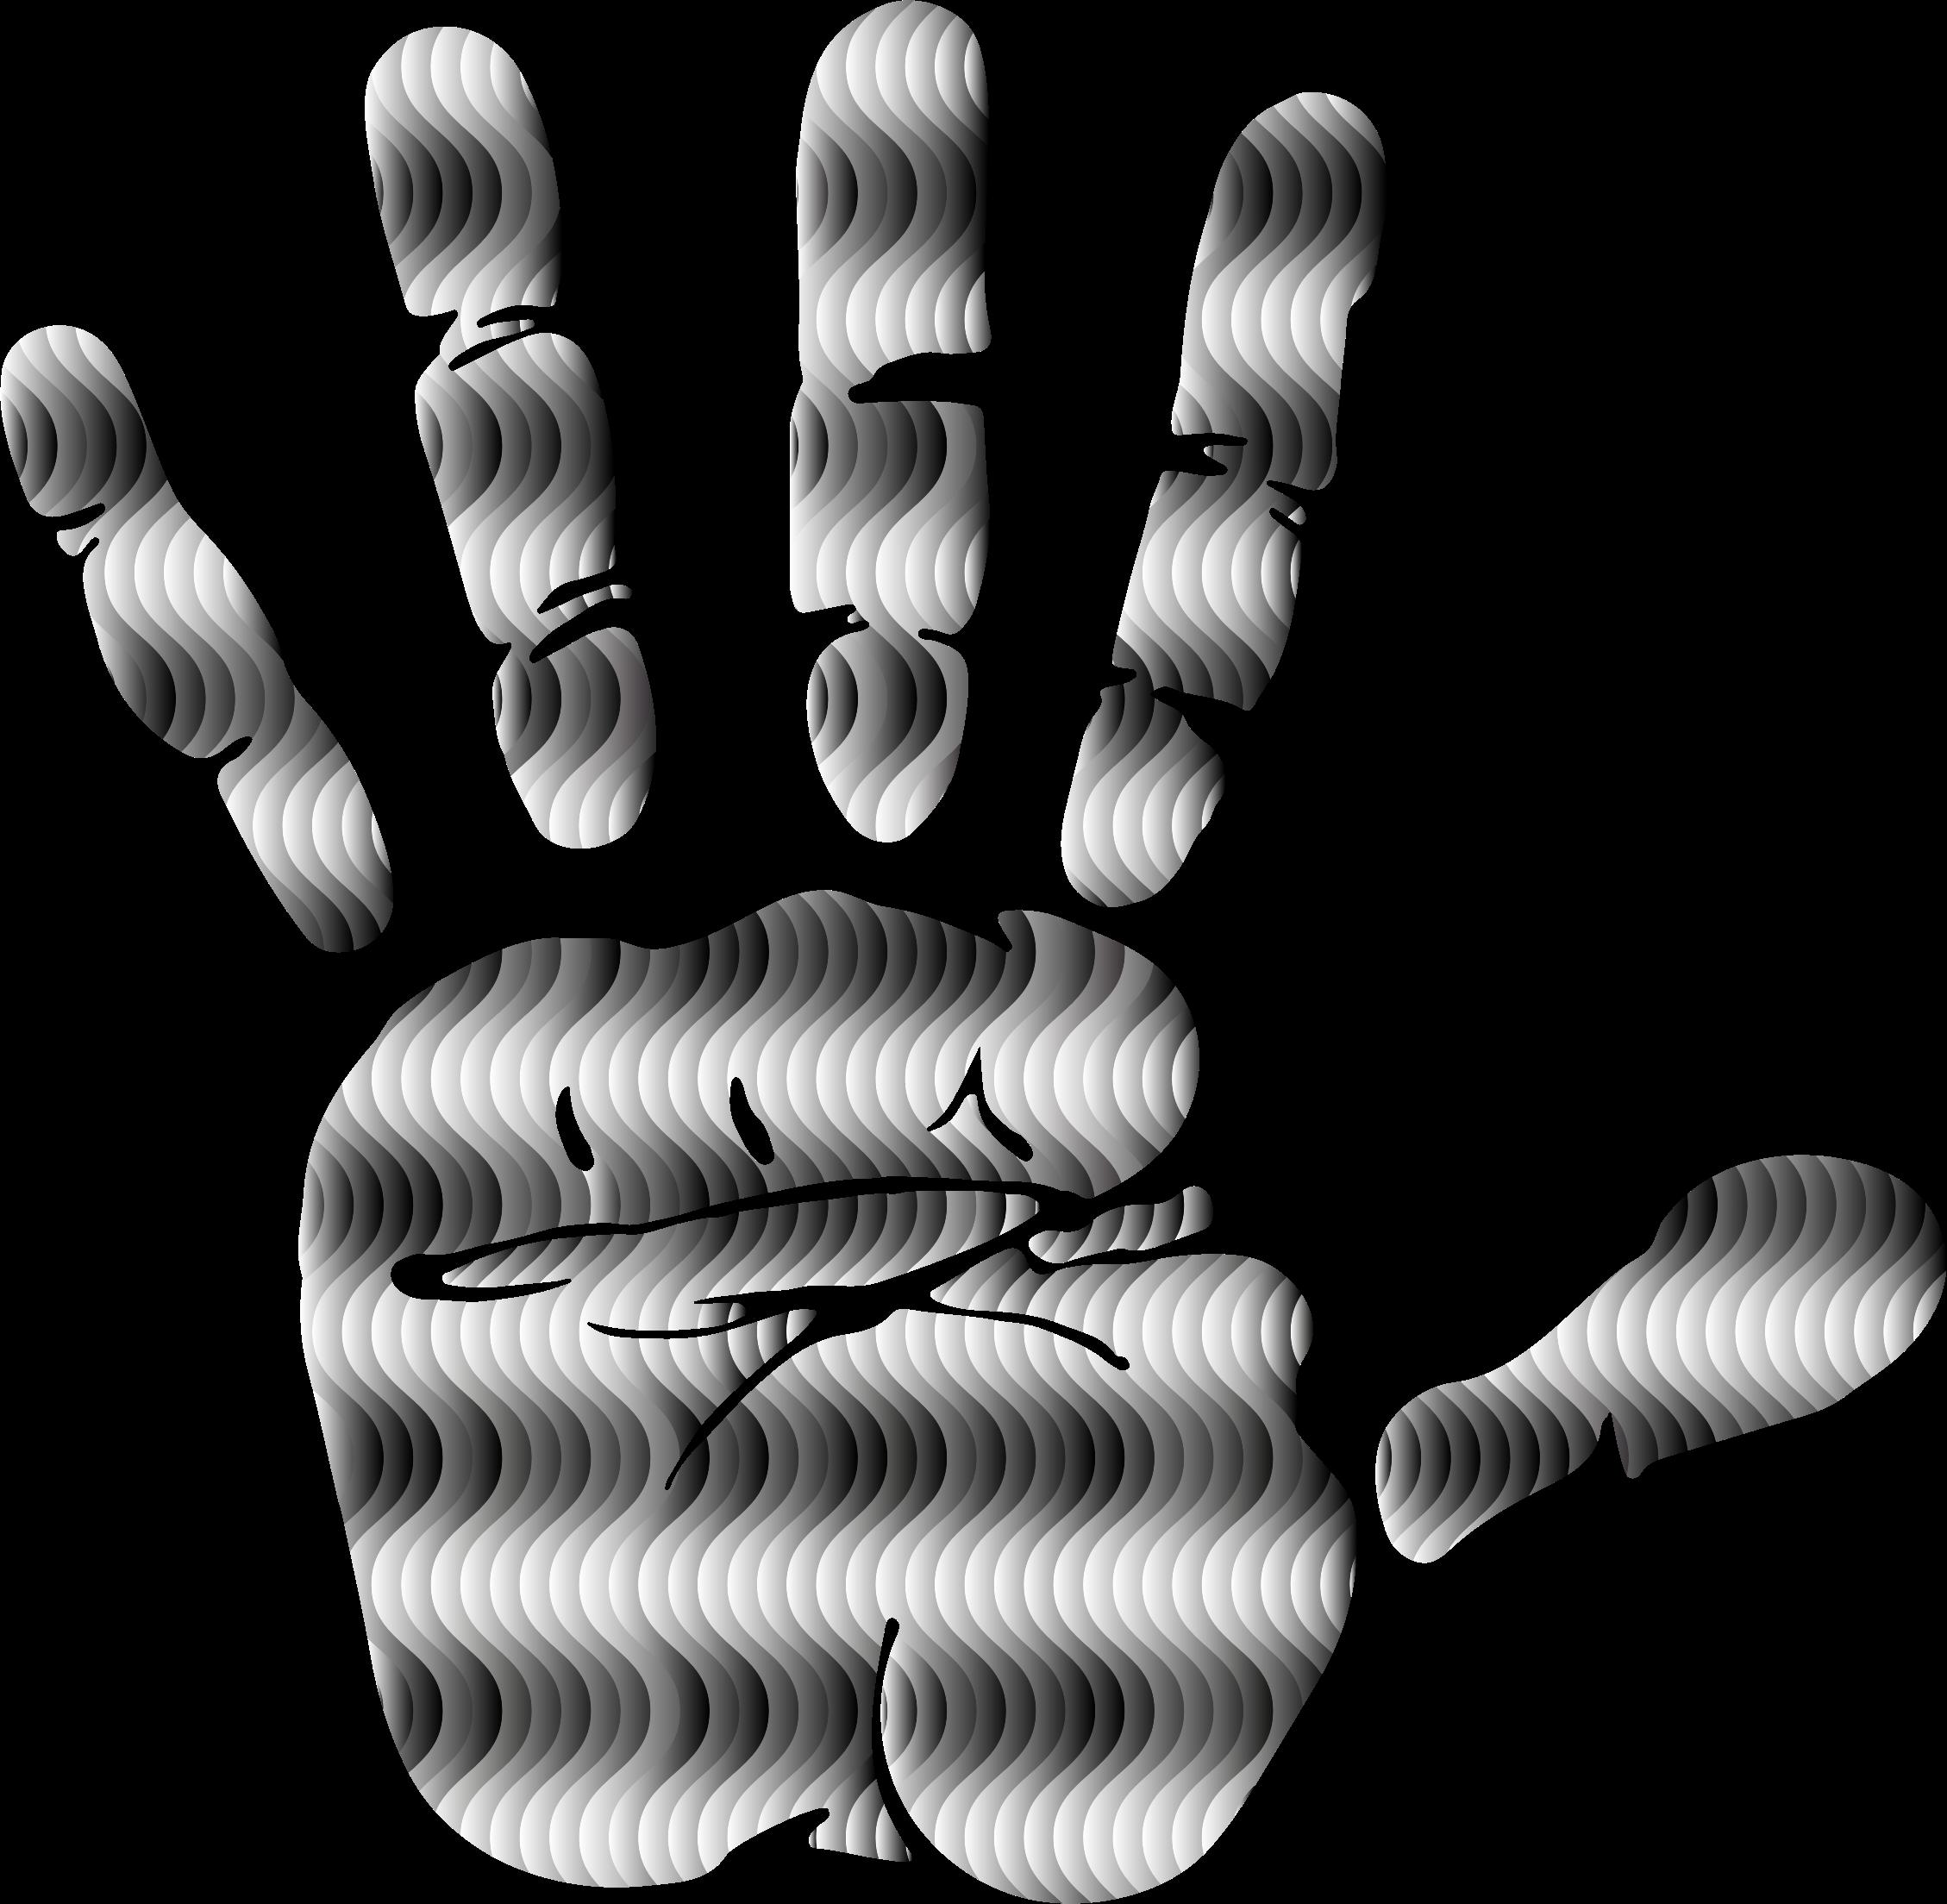 Waves clipart silhouette. Prismatic handprint big image